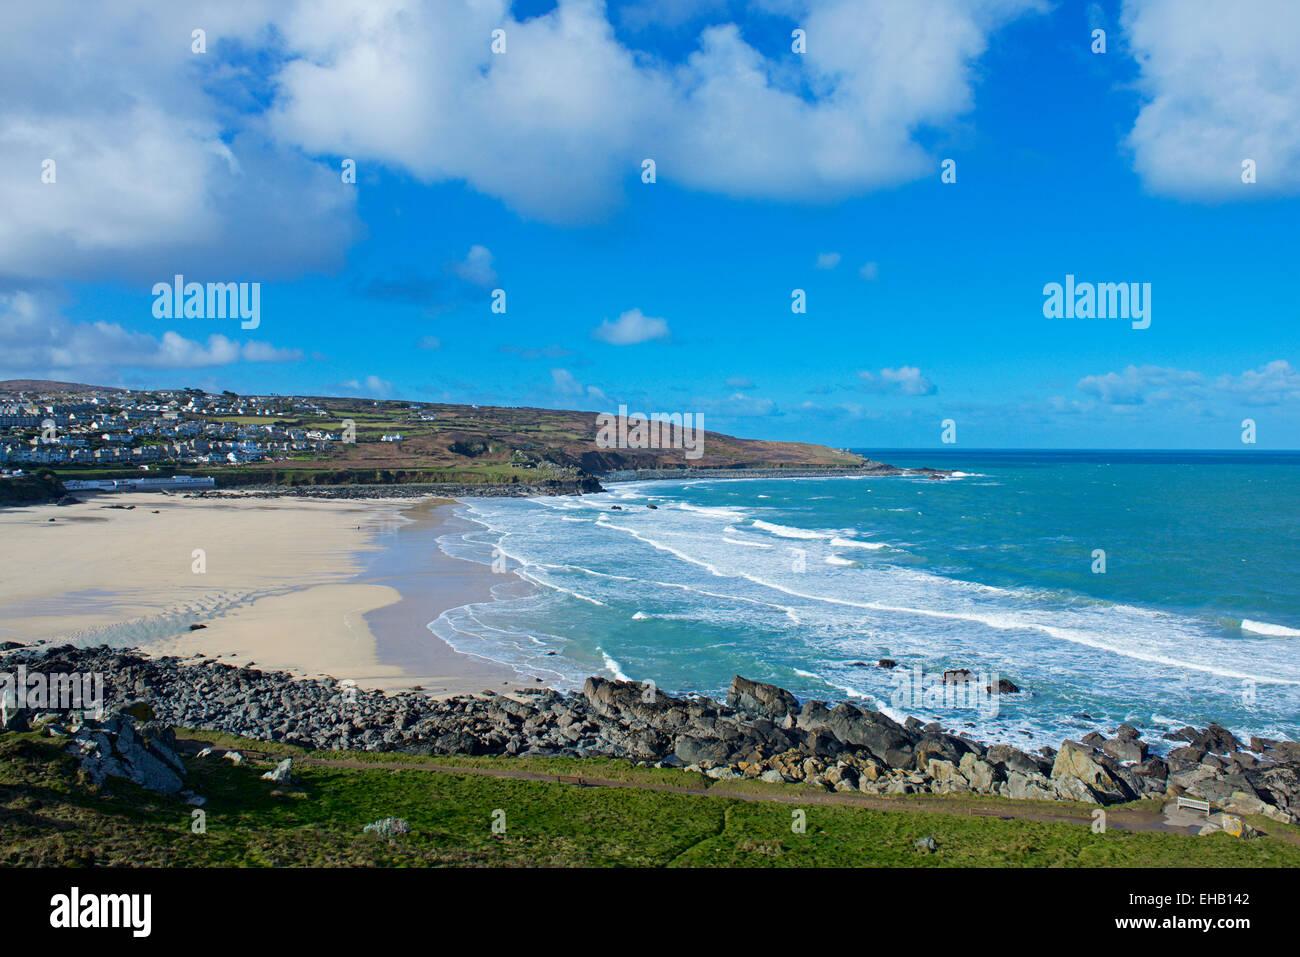 Beach at Newquay, Cornwall, England UK - Stock Image